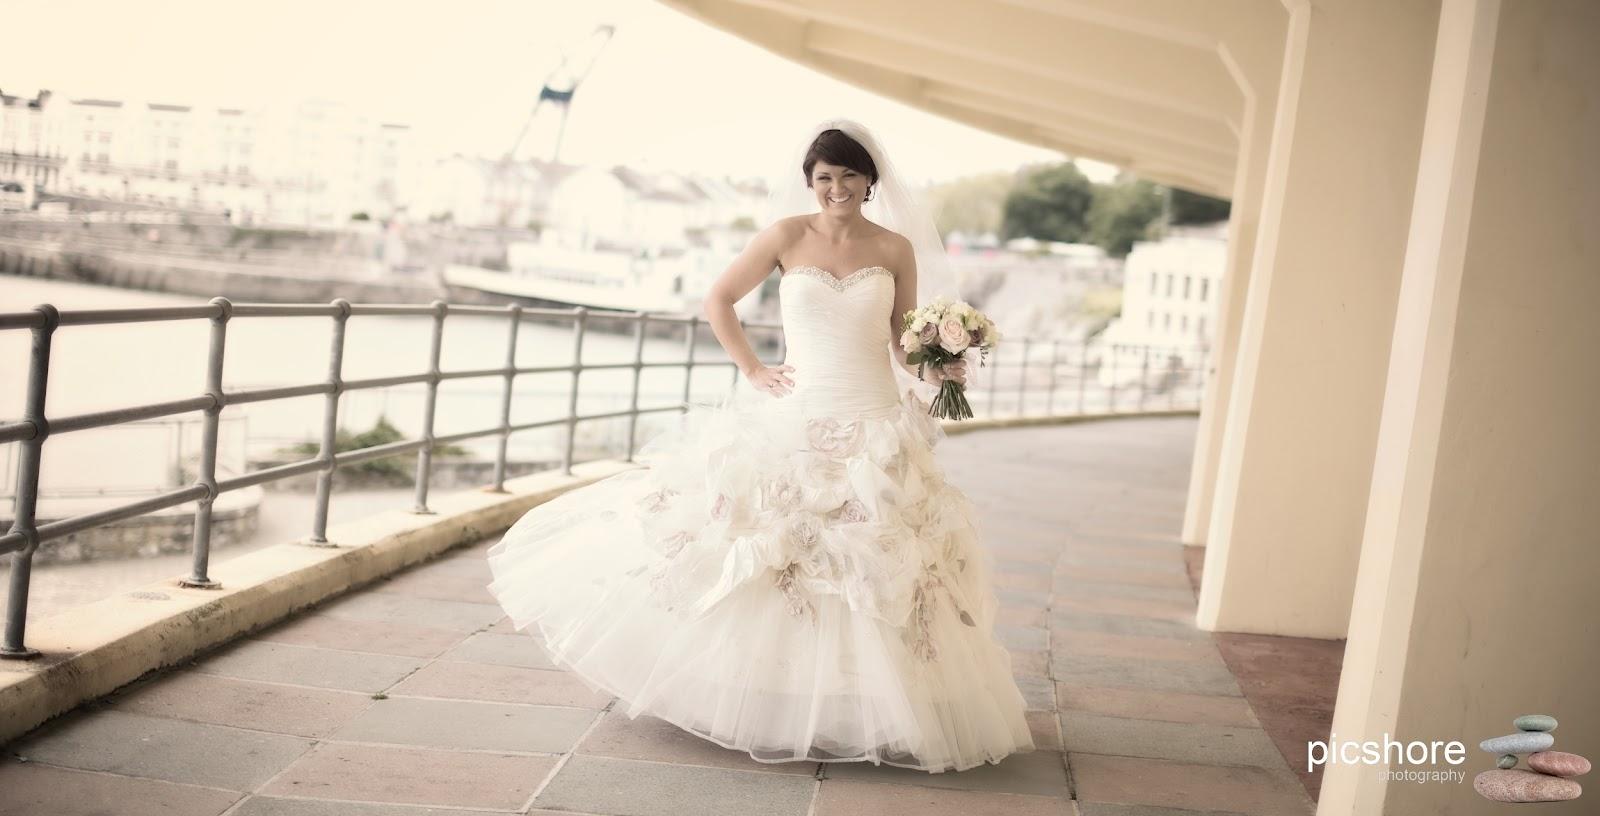 Cheap Wedding Photography Plymouth: Picshore Photography: Photos From The Wedding Of Becky